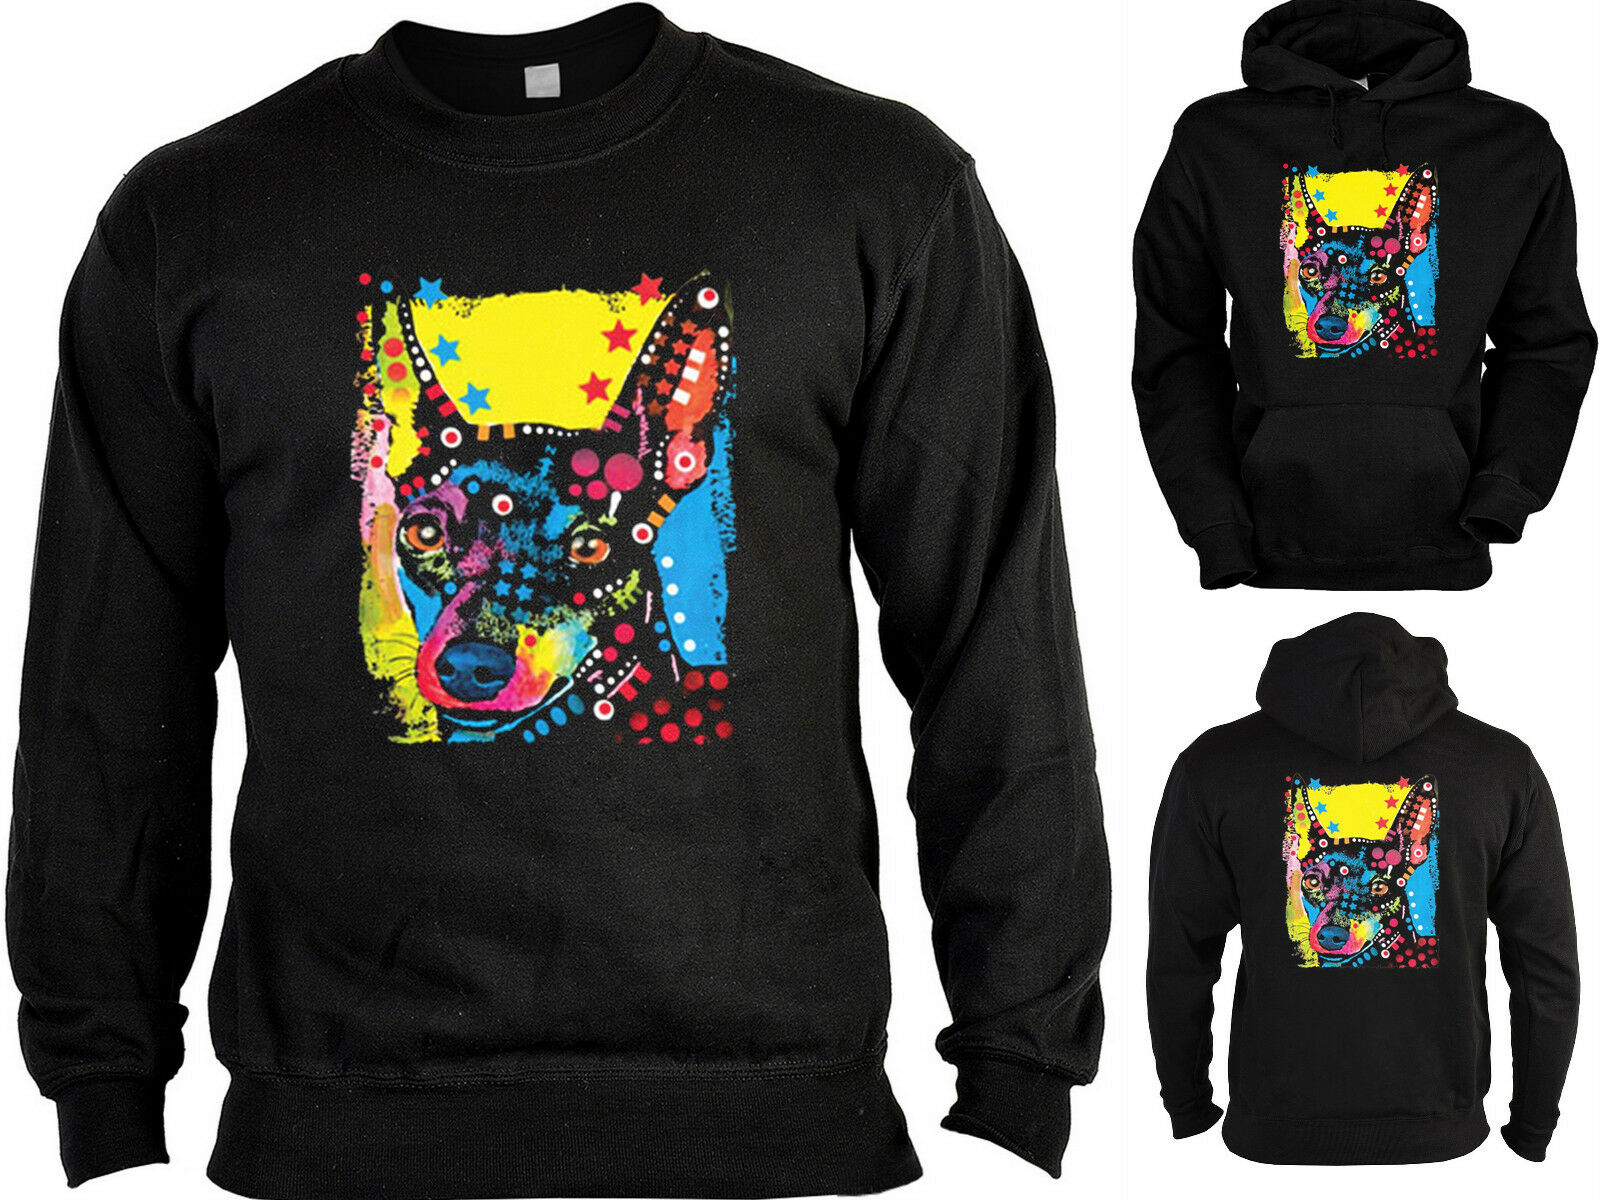 Zwergpinscher Sweater - Kapuzensweater - Zip Hoodie Hunderassen Hunde Motiv